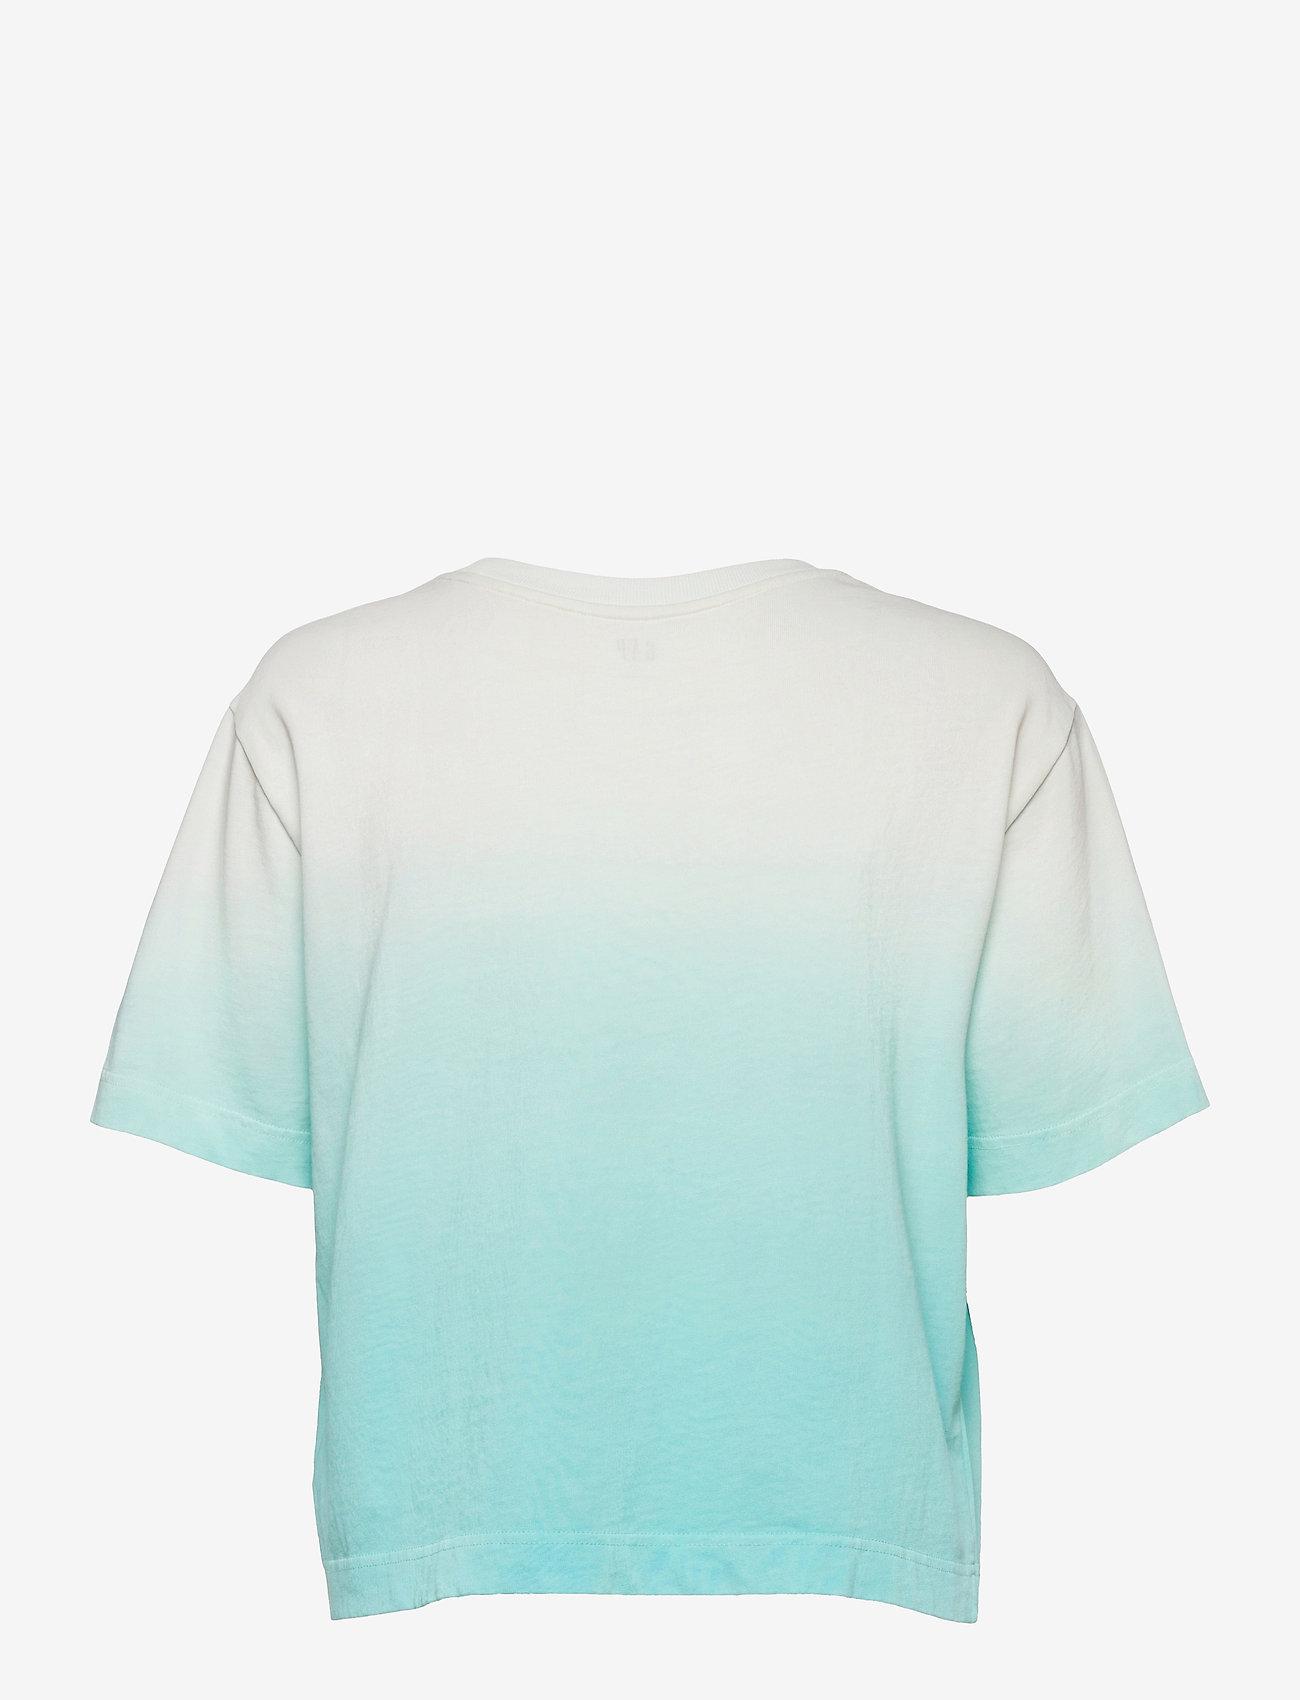 GAP - GAP BOXY SS TEE - t-shirts - ombre blue - 1